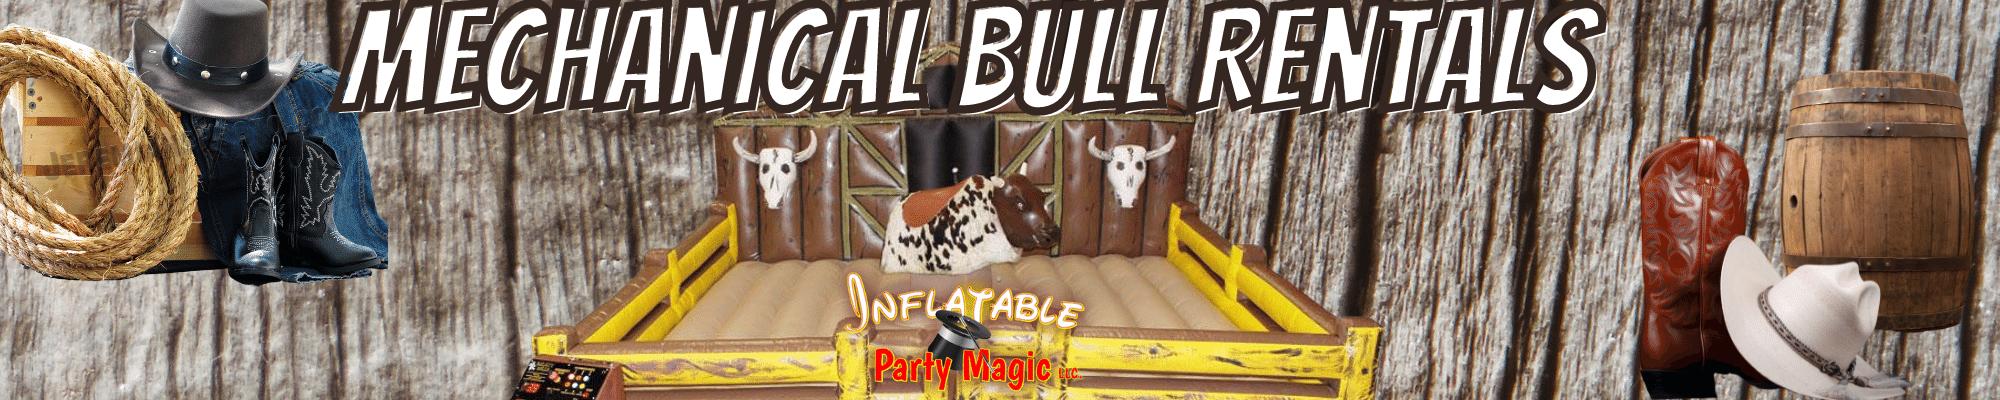 Maypearl Mechanical Bull Rentals